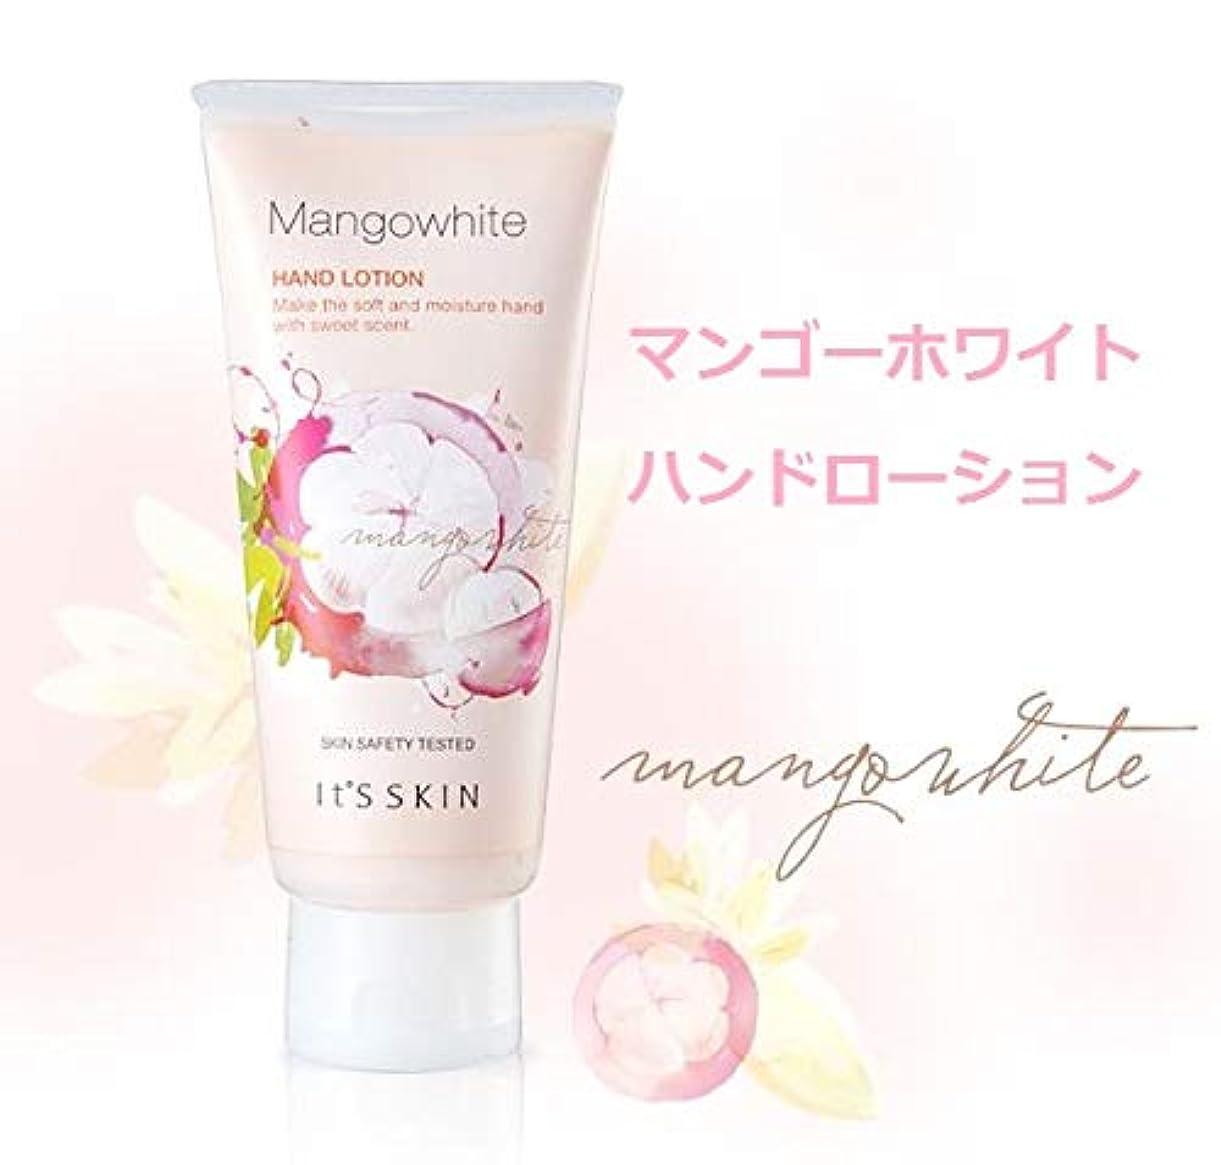 Its skin Mangowhite Hand Lotion イッツスキン マンゴーホワイト ハンドローション 75ml [並行輸入品]